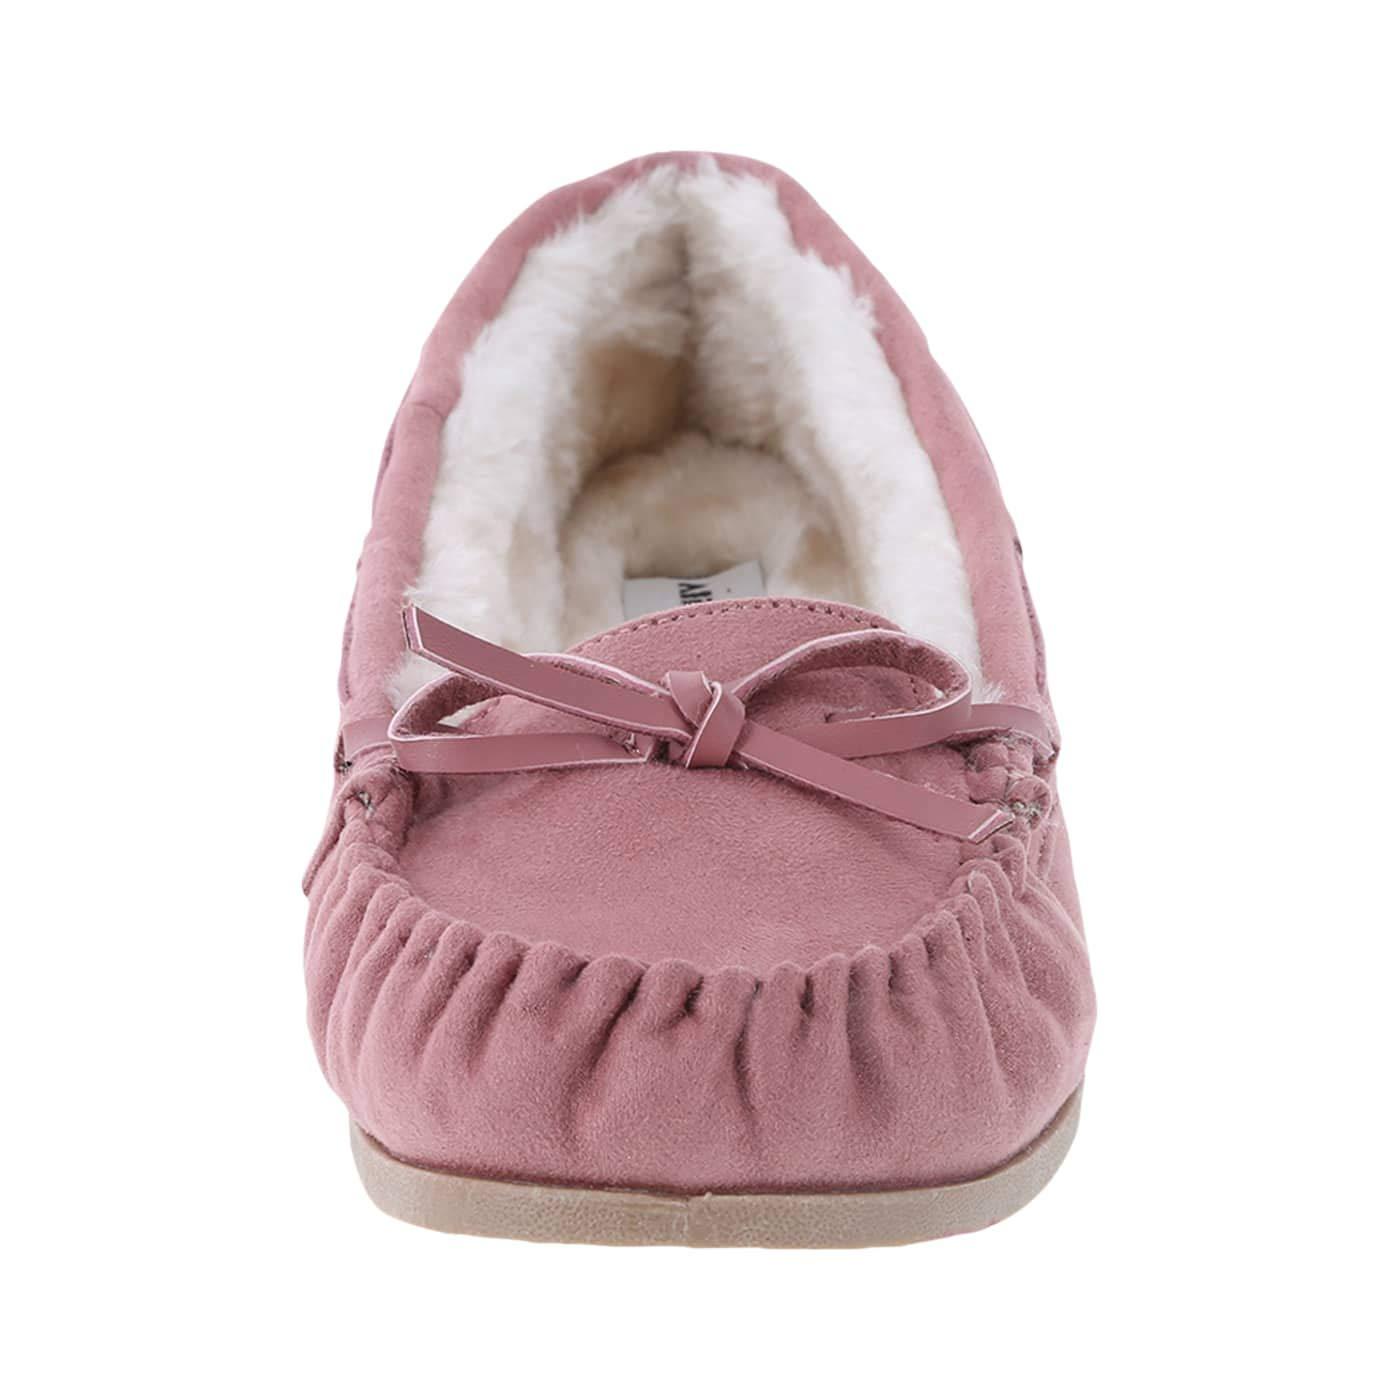 Airwalk Women s Flurry Moc  Amazon.ca  Shoes   Handbags b750331fd